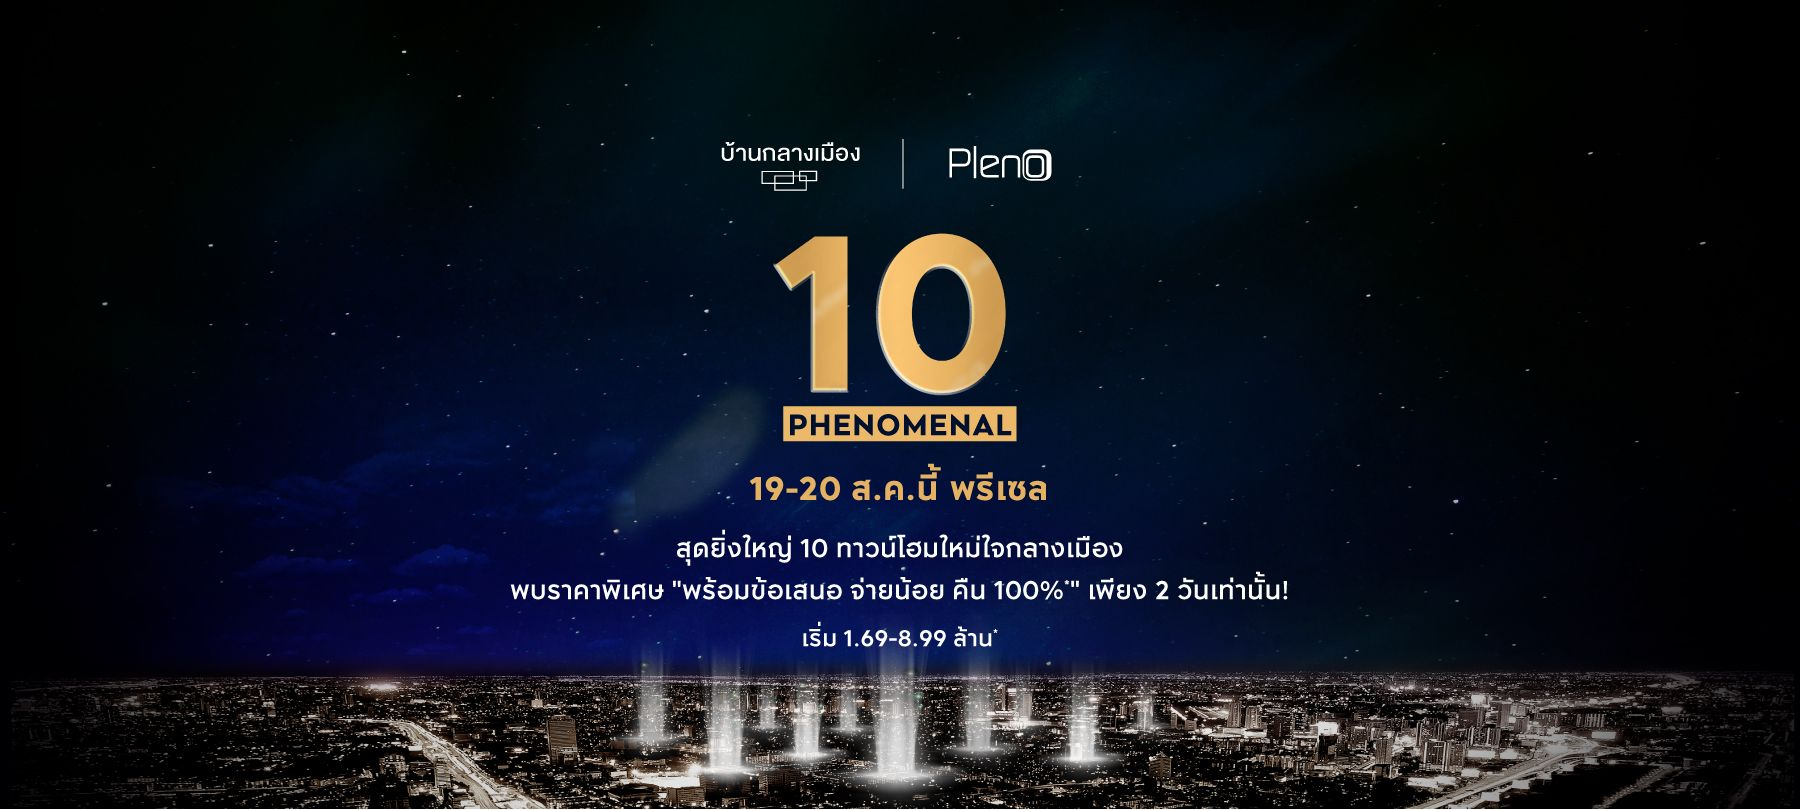 The Phenomenal 10